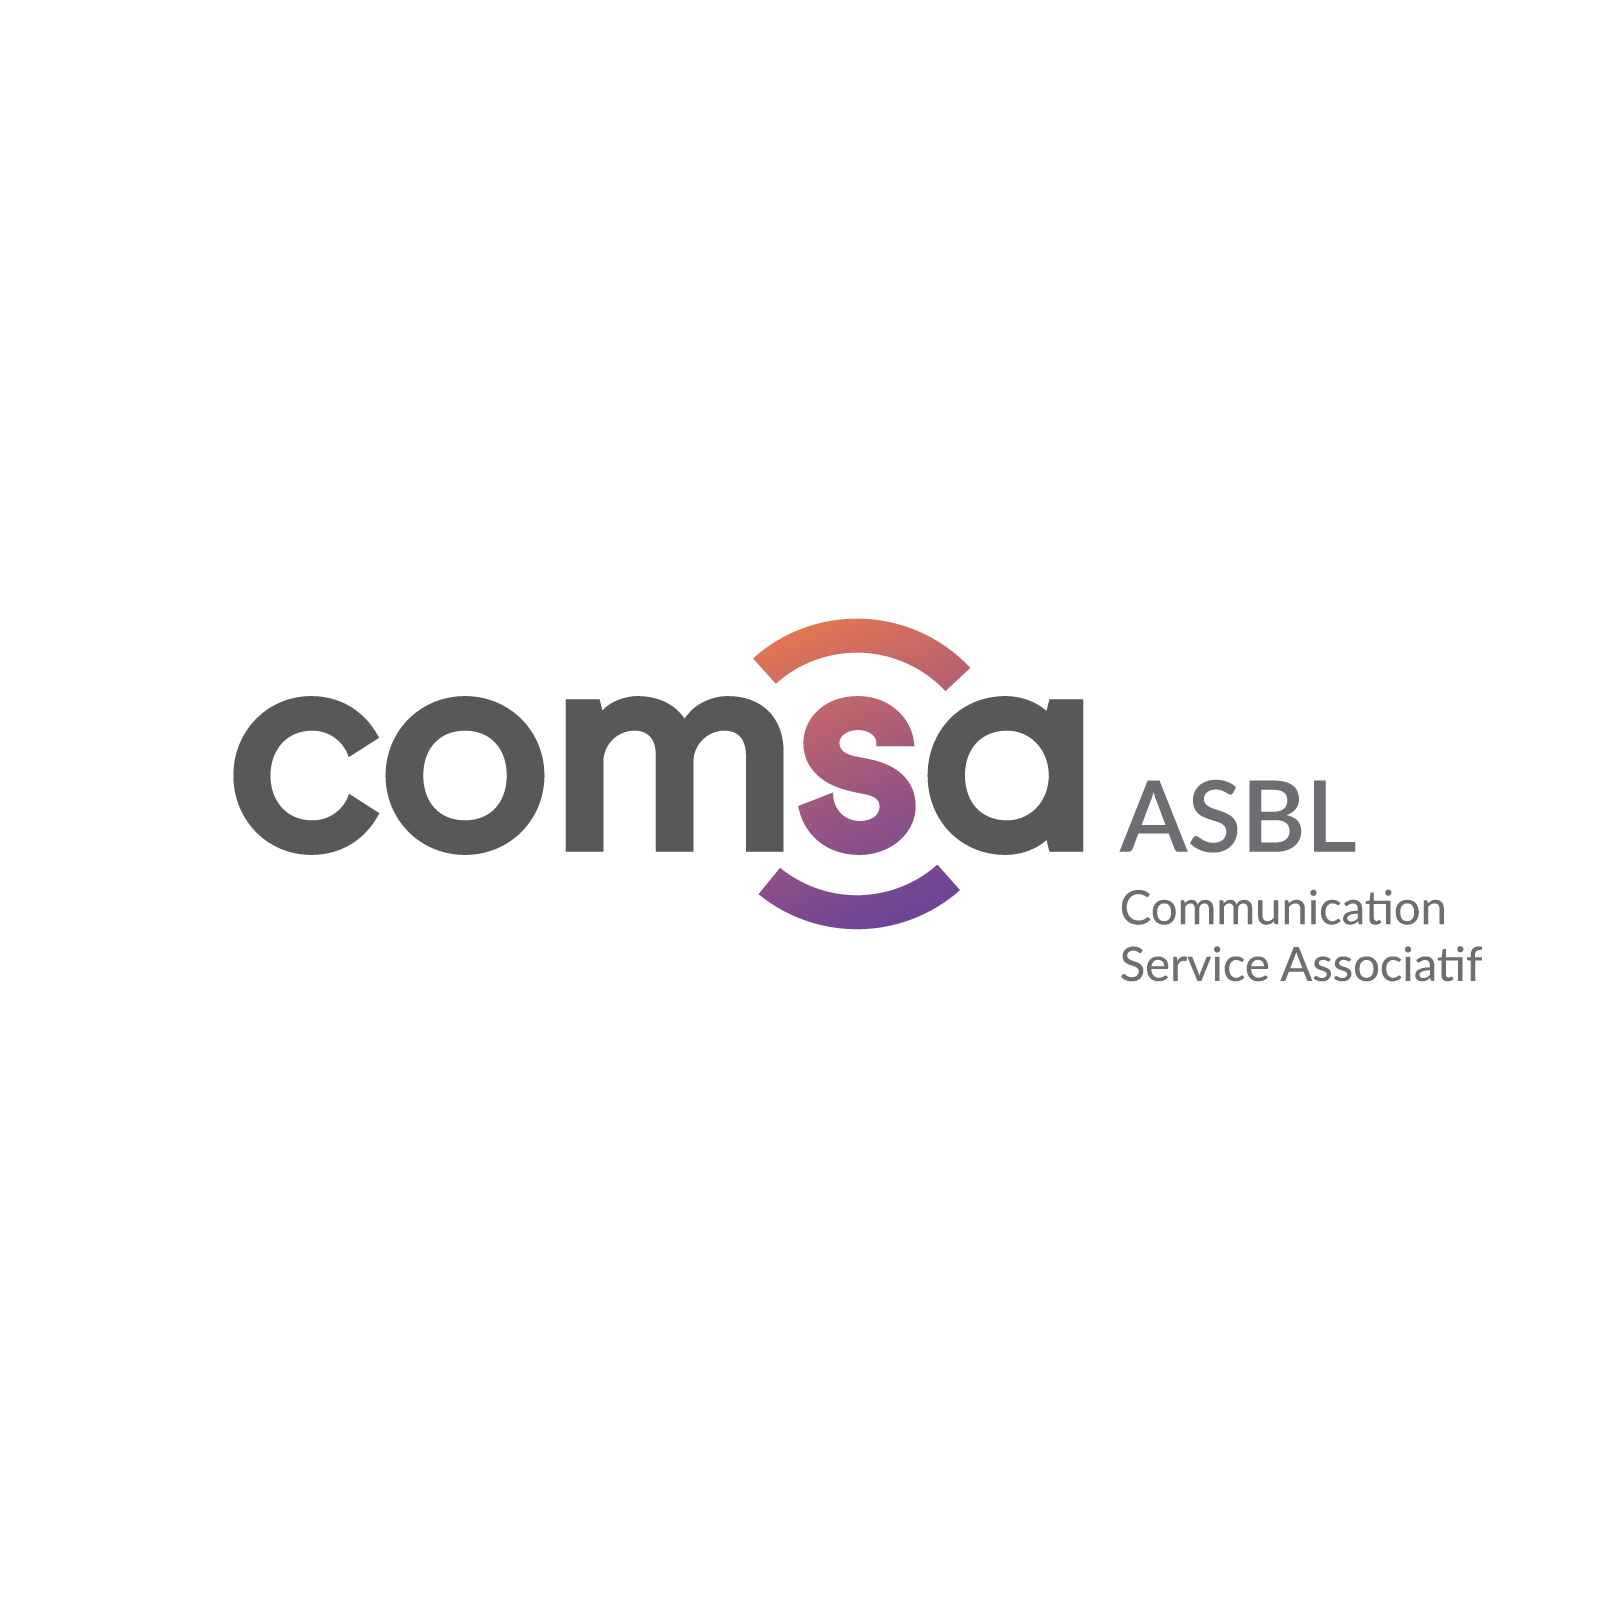 COMSA ASBL